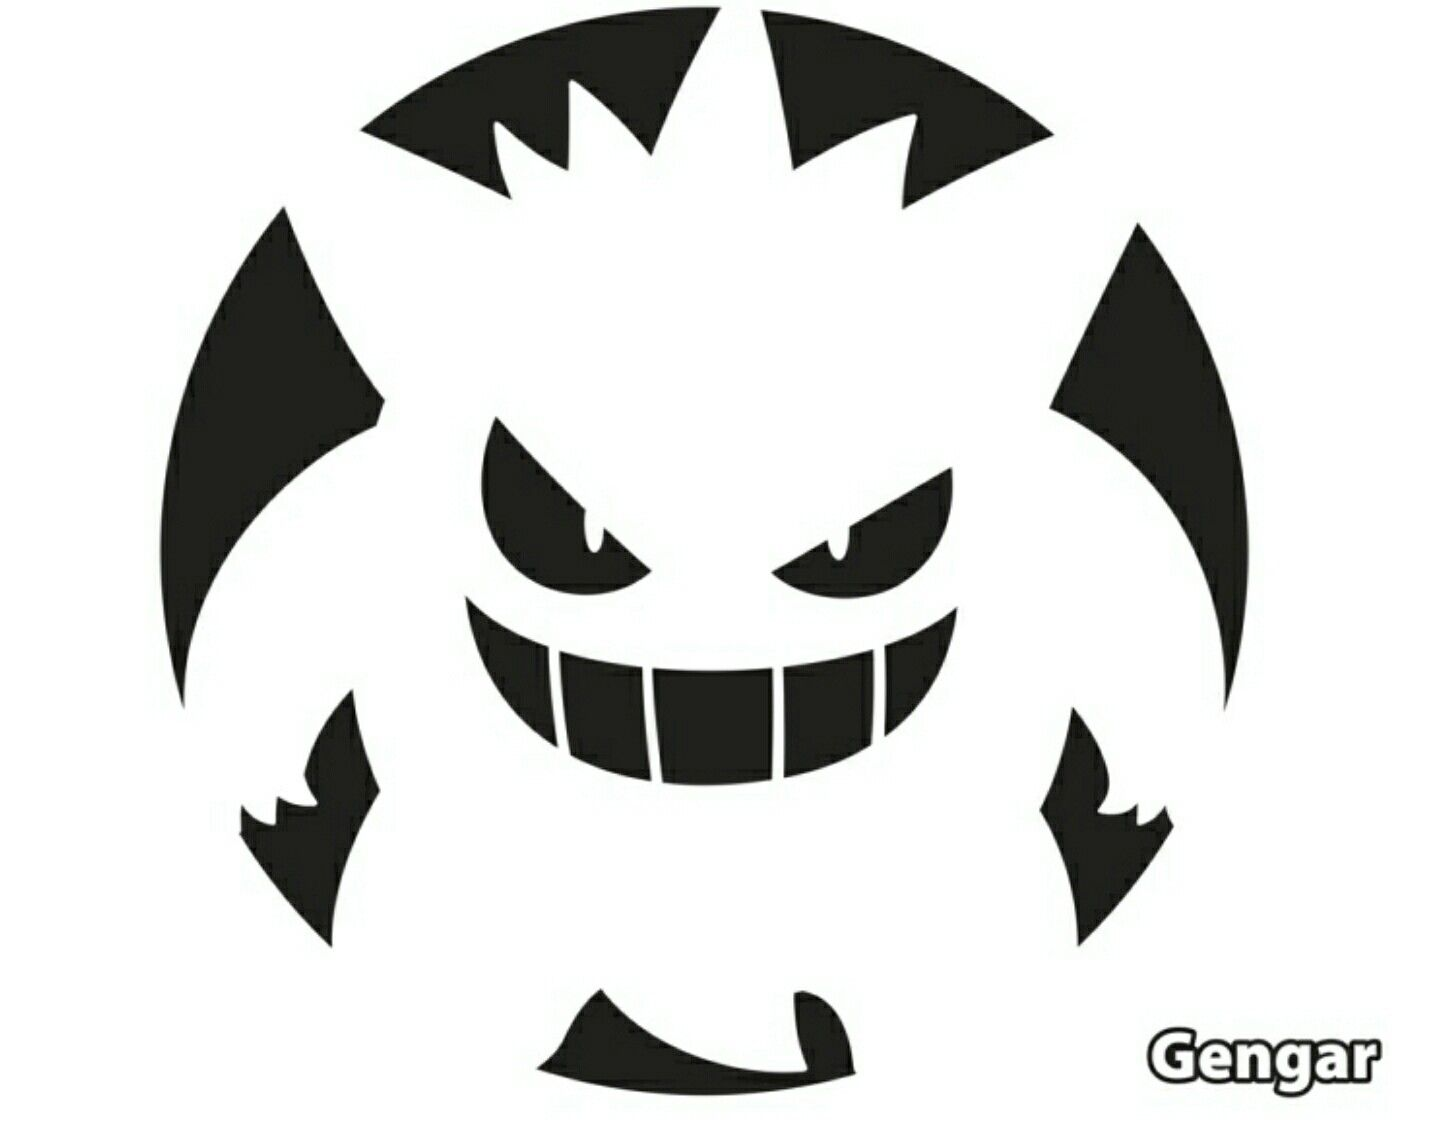 pumpkin template gengar  Gengar Jack-o-lantern Pattern in 7   Pokemon pumpkin ...